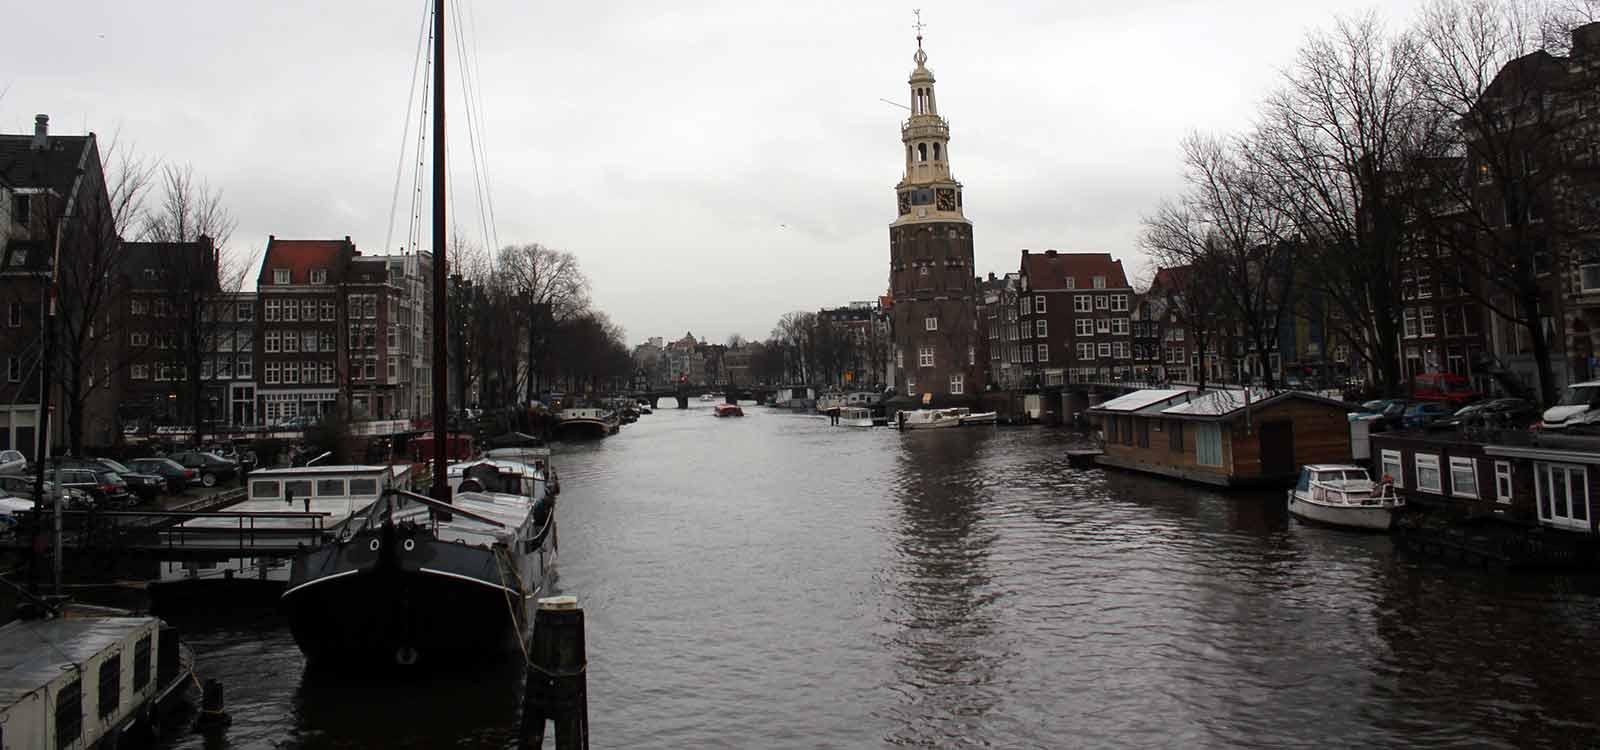 voyage-belgique-pays-bas-3